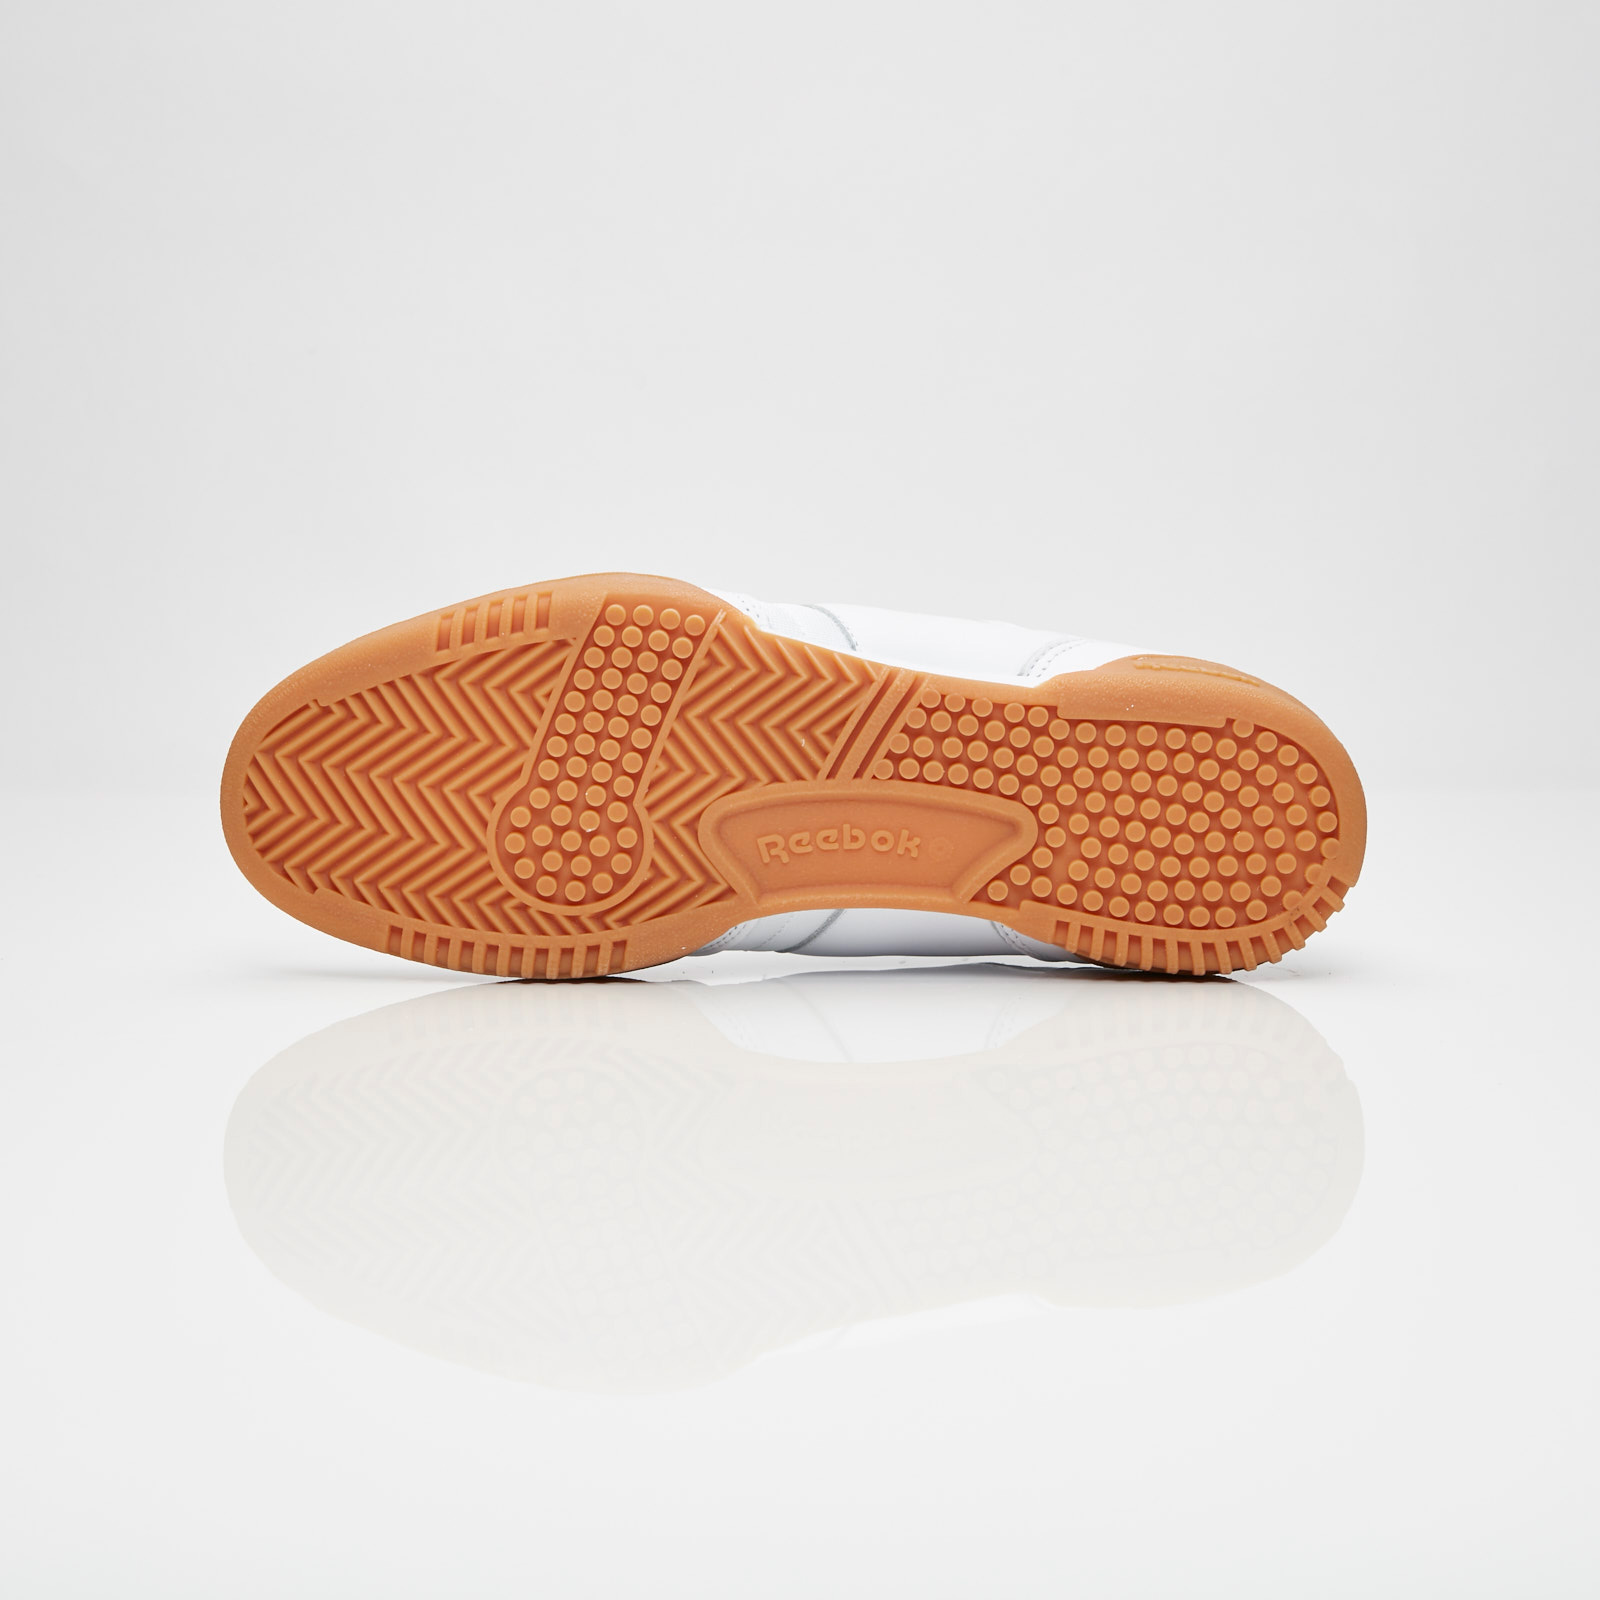 7098b1e8ad7 Reebok Workout 85 Txt - Cn3660 - Sneakersnstuff